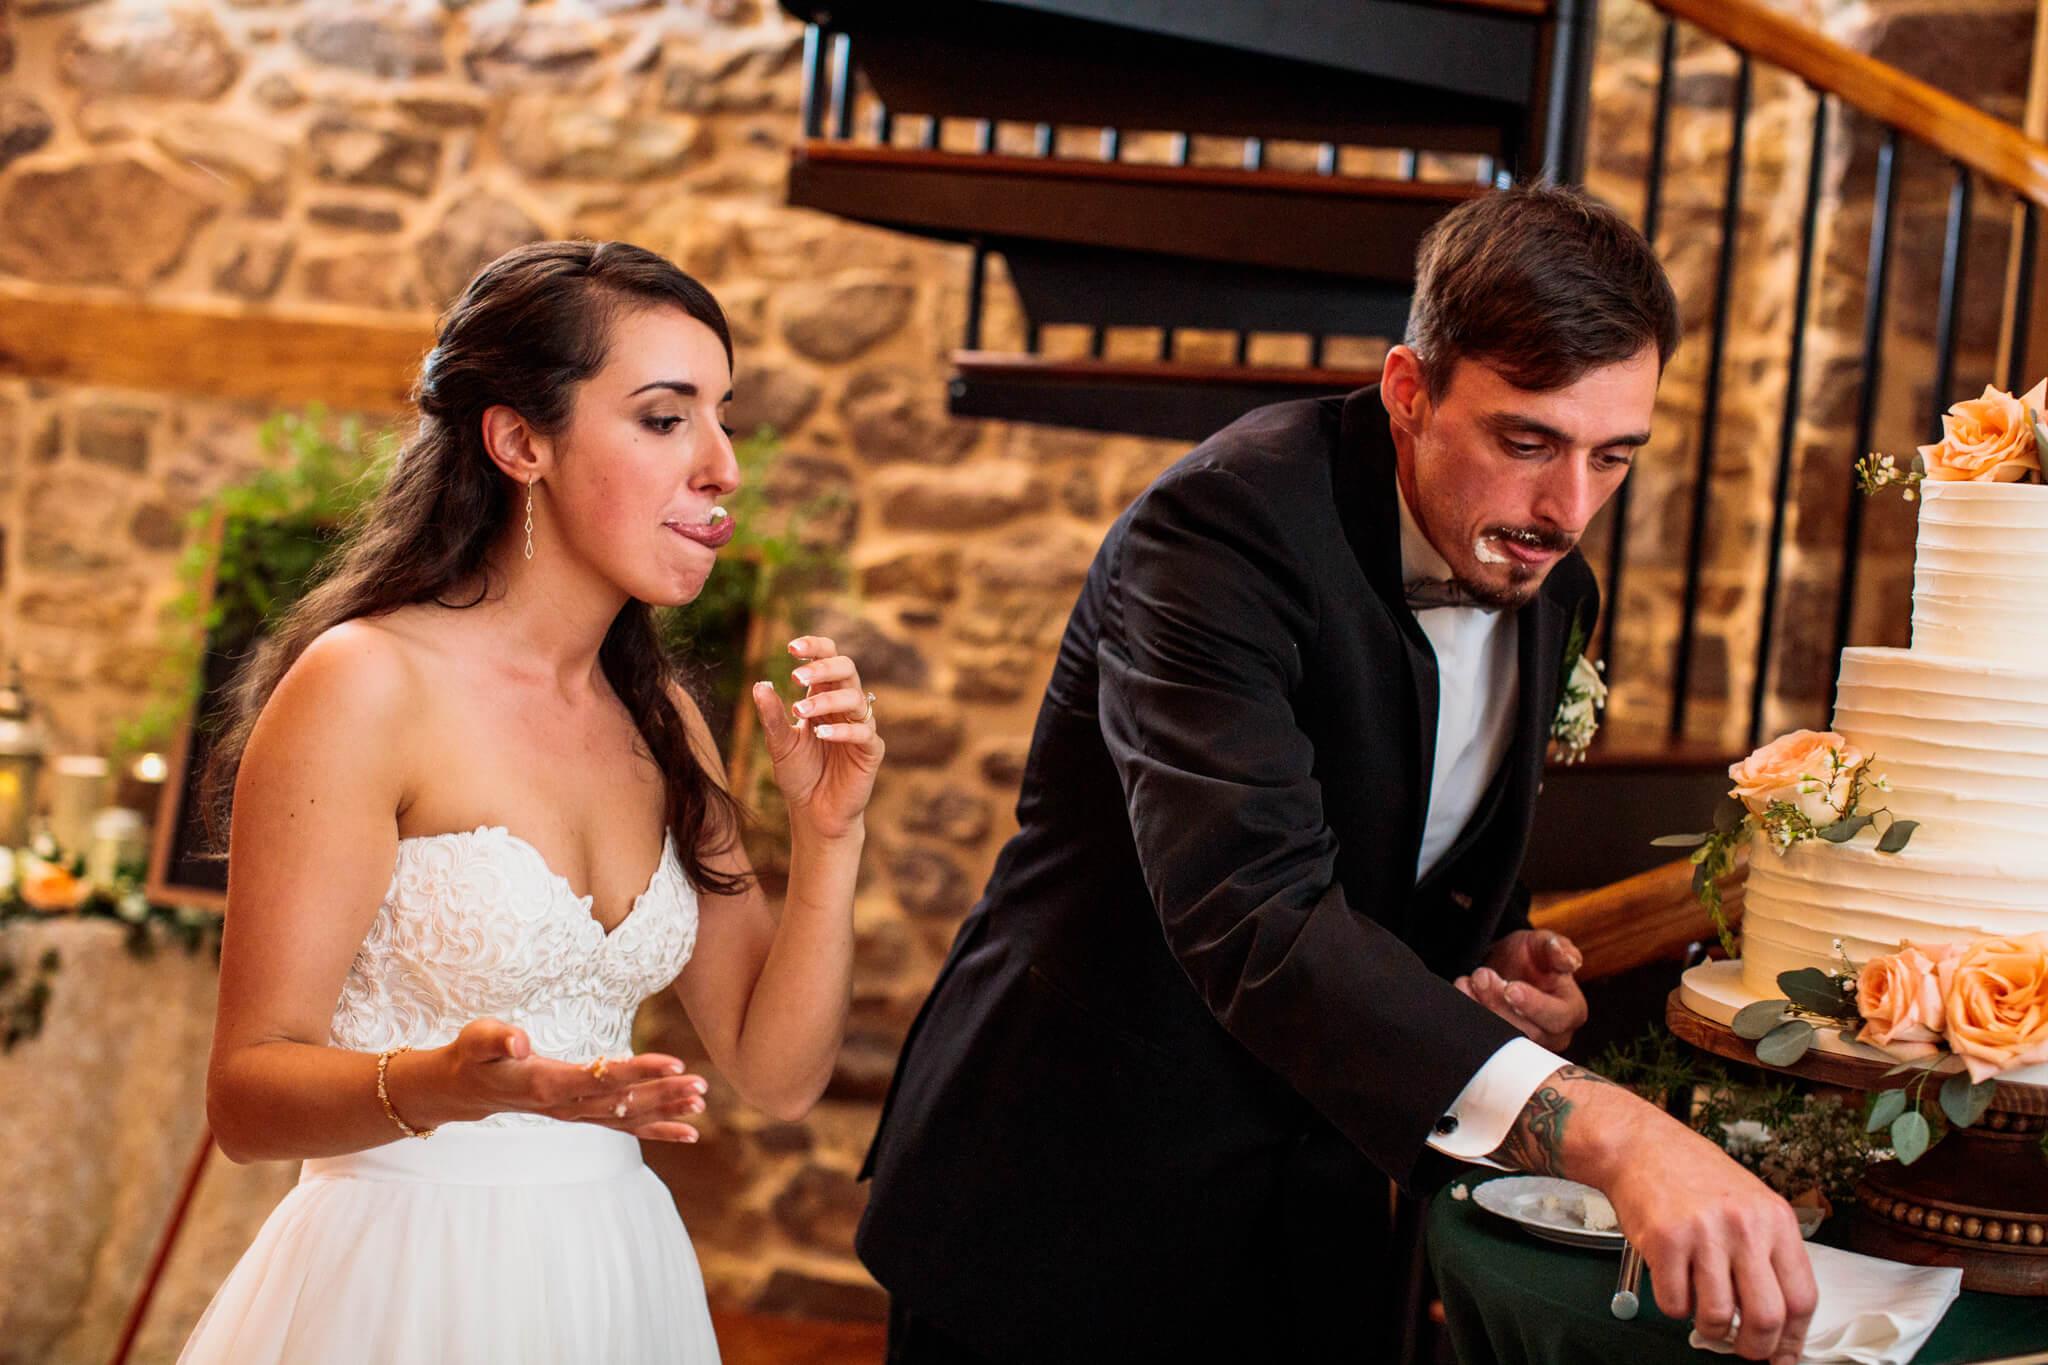 Alysia Jerad Homestead Blessings Farm Hershey PA Wedding Rustic Chique - 89.JPG